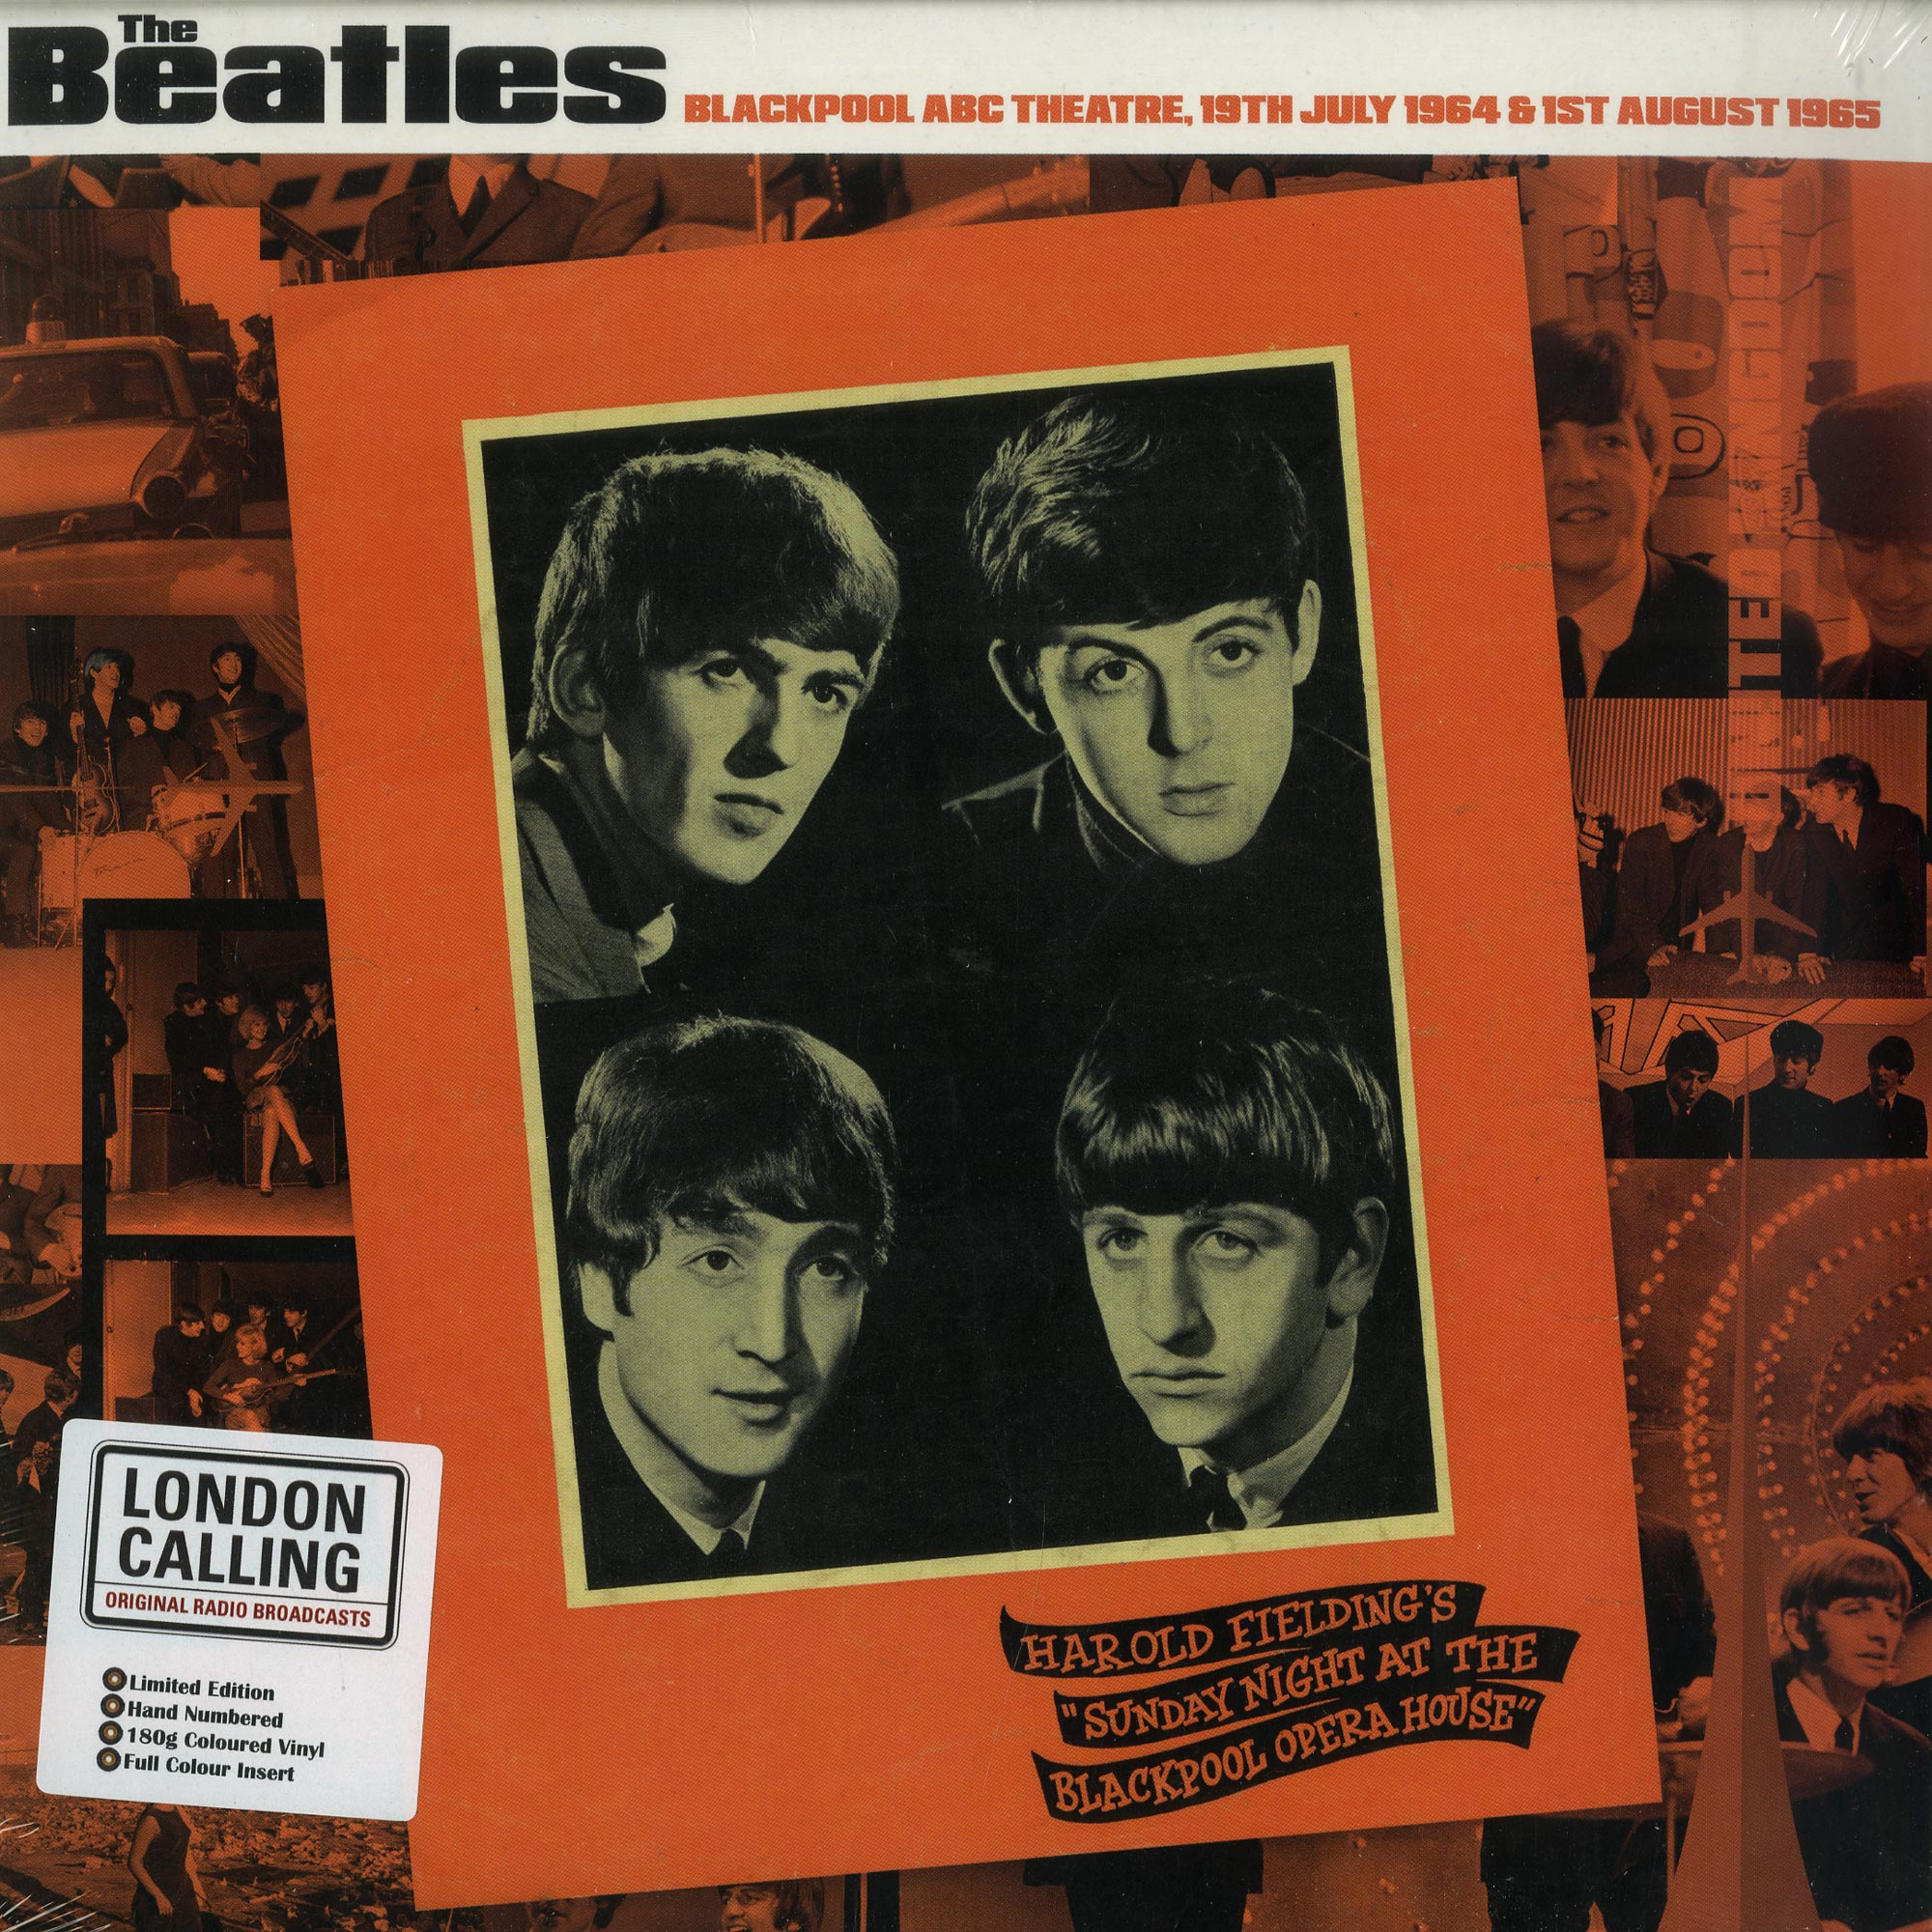 The Beatles - BLACKPOOL ABC THEATRE 1964/65